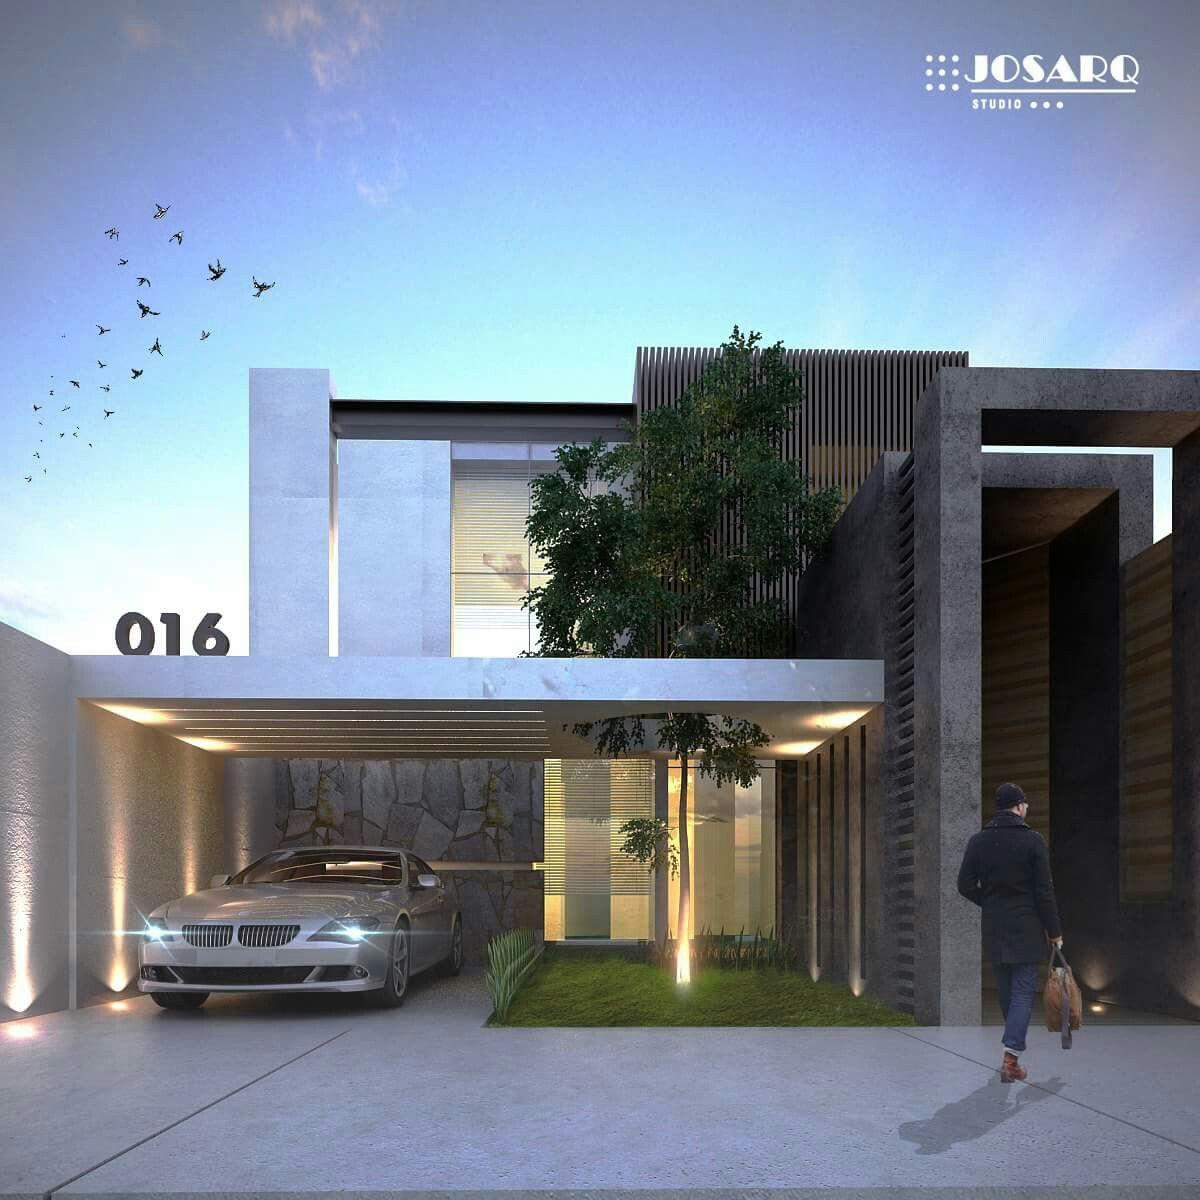 Pin von Eliany Aruachan auf Frentes de casas | Pinterest | Moderne ...